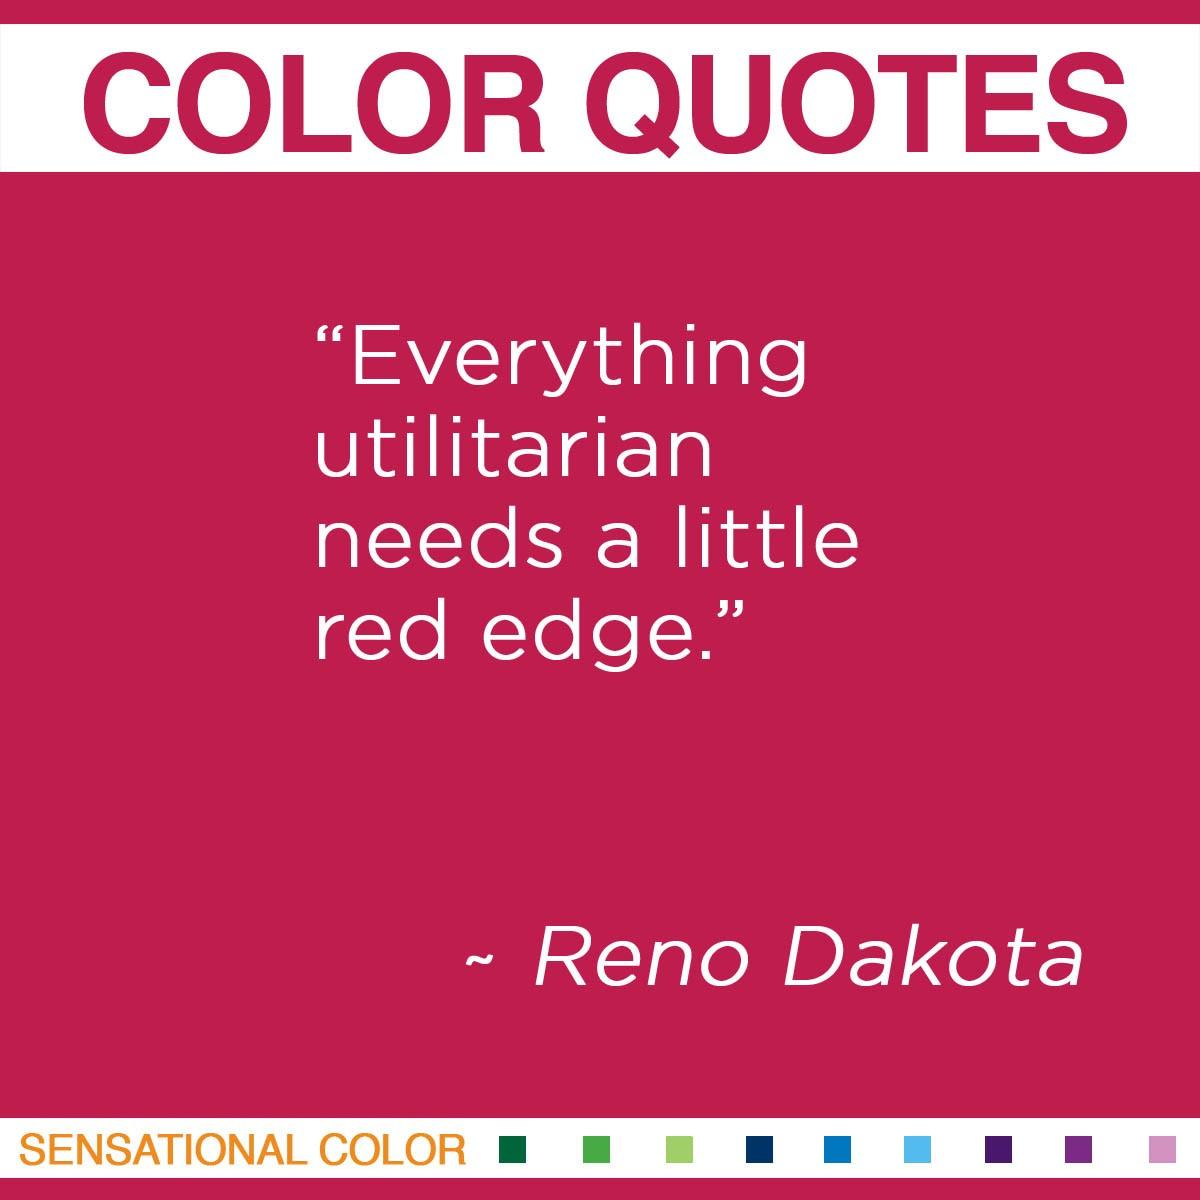 """Everything utilitarian needs a little red edge."" - Reno Dakota"